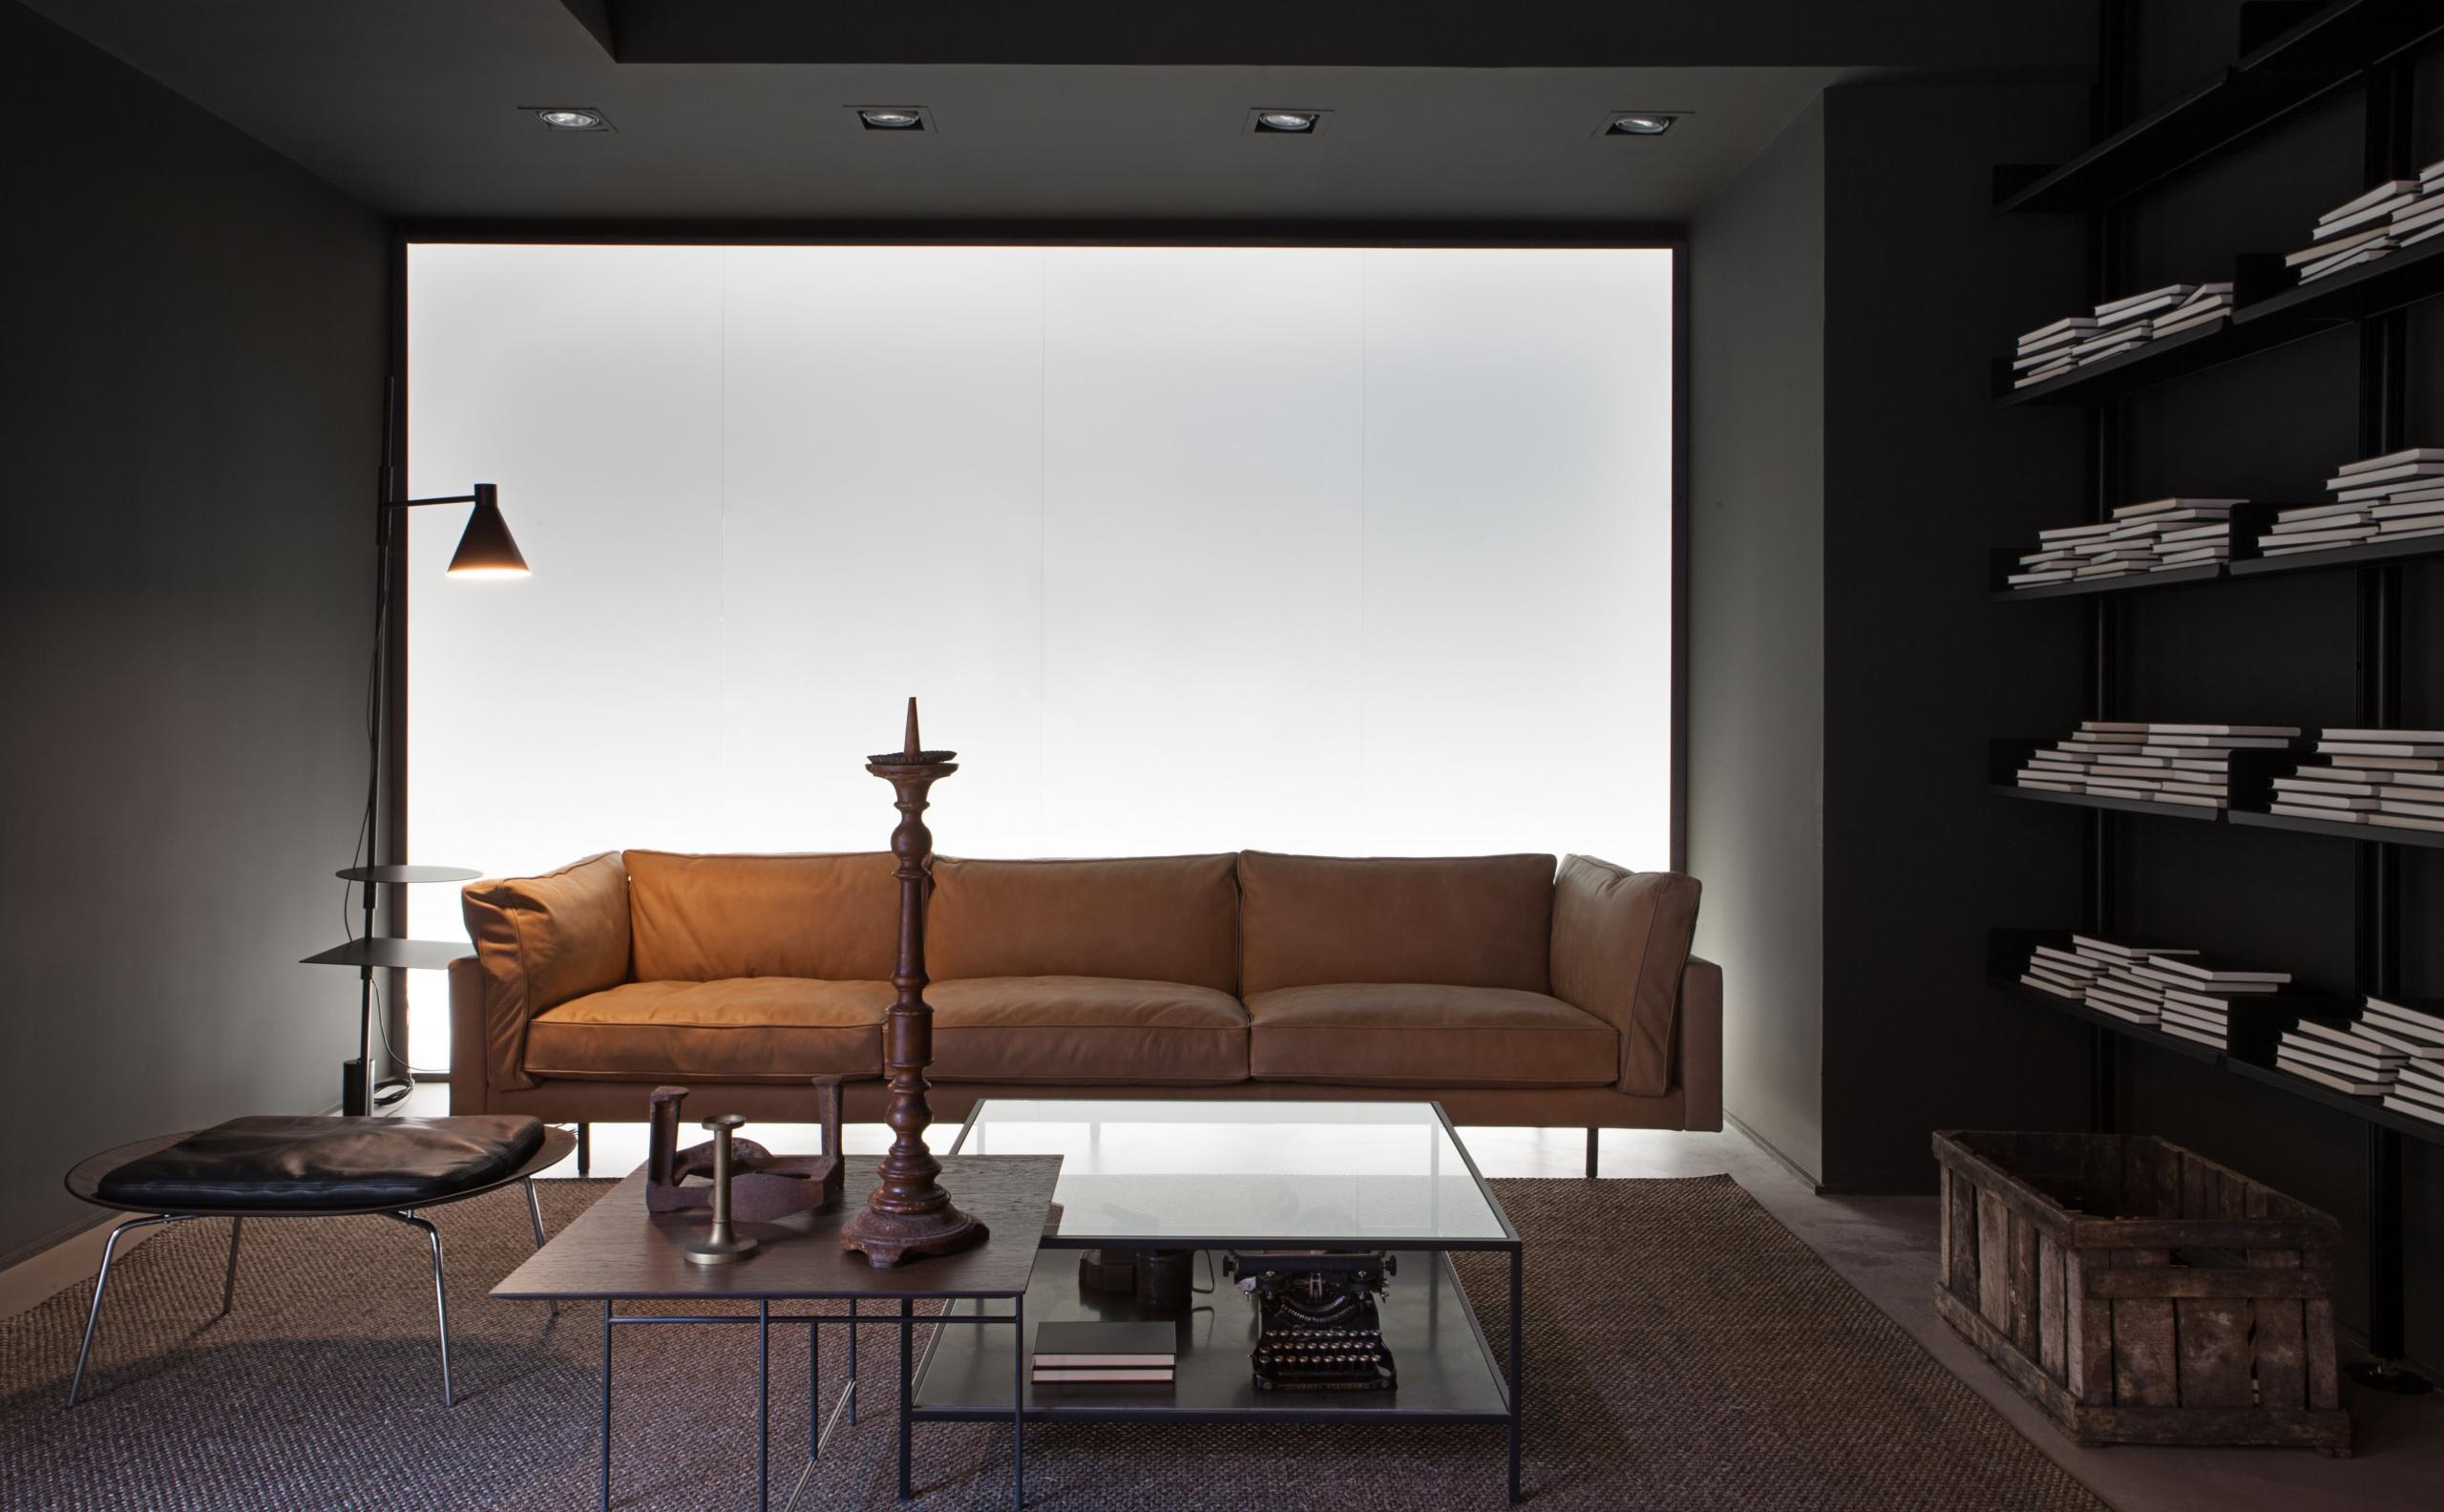 Boffi DePadova News: Boffi | De Padova opens the doors to a new design space in Madrid 4